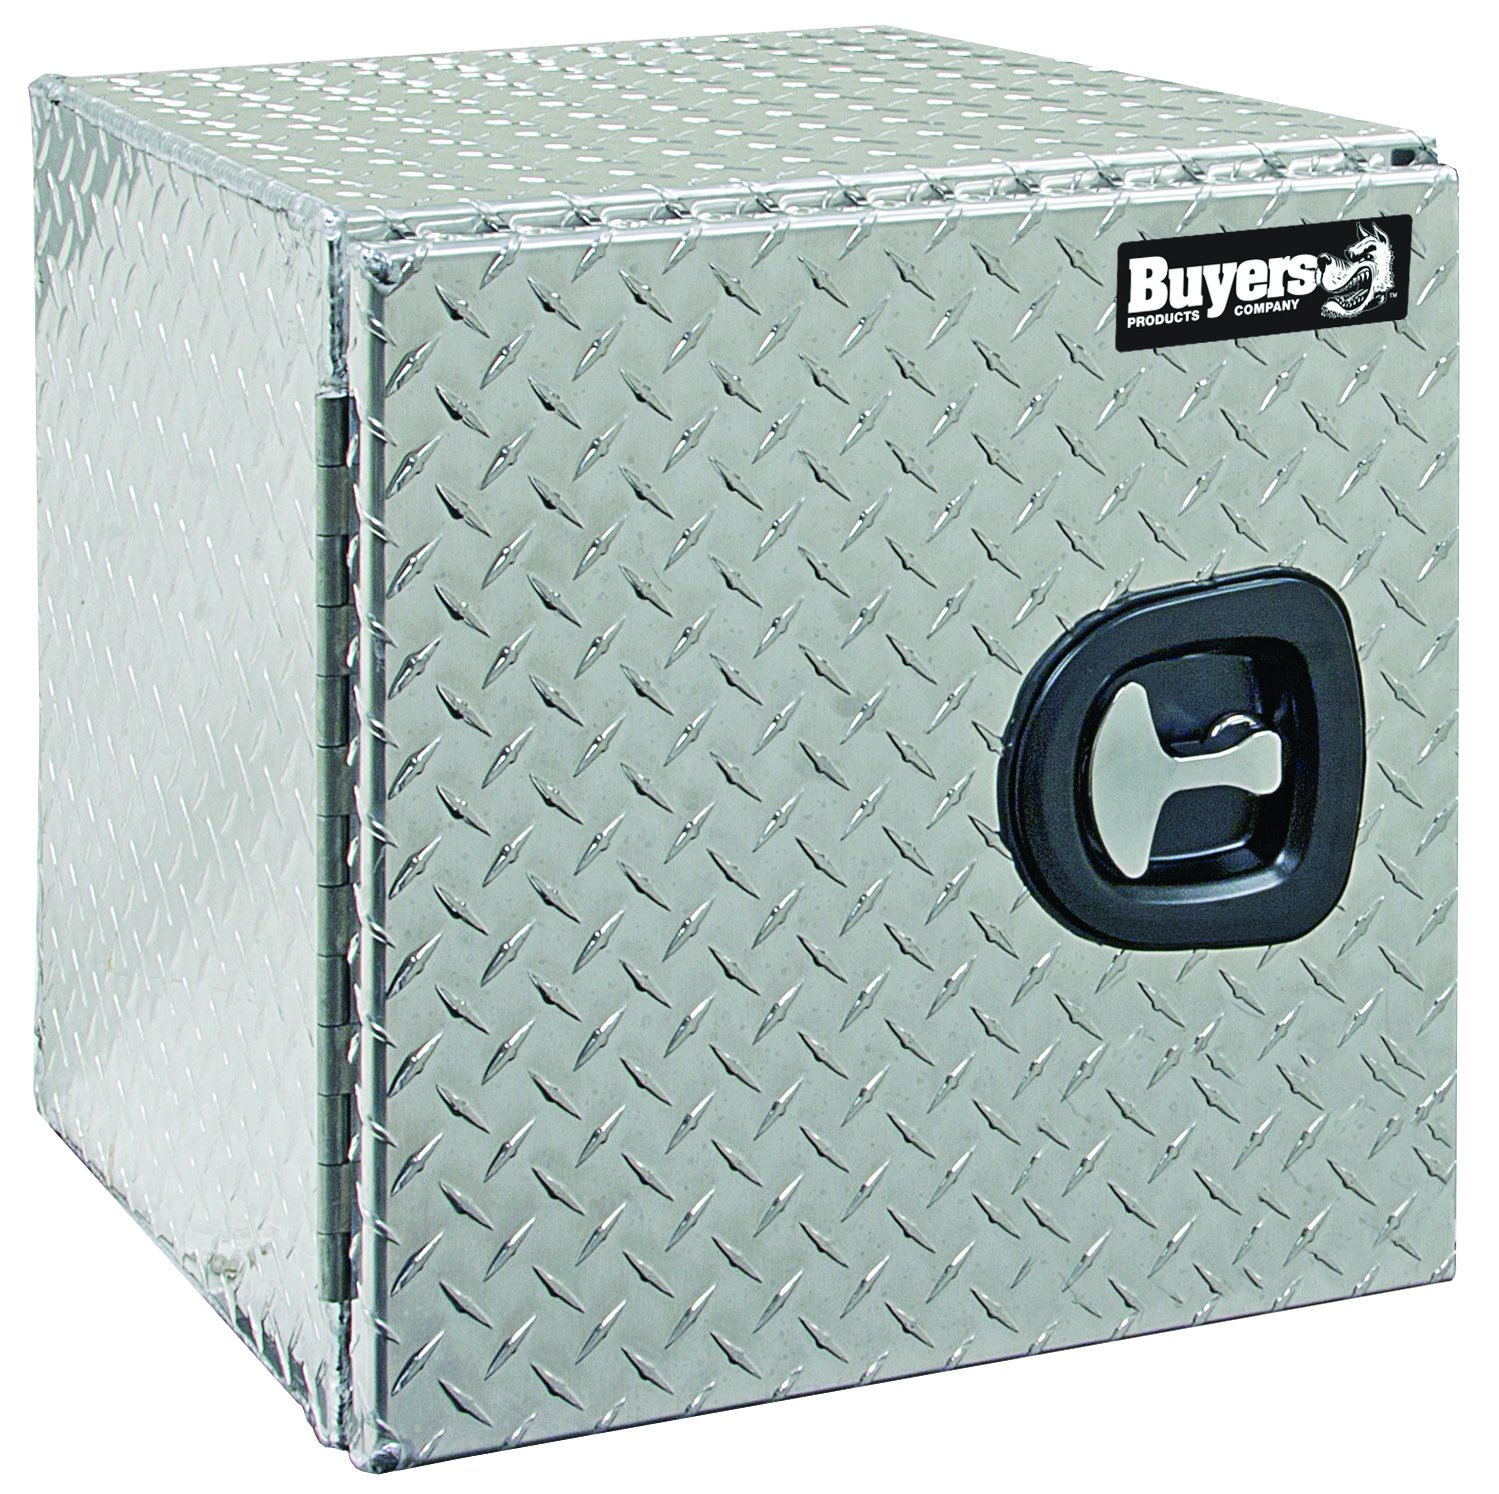 18x18x30 Inch Buyers Products Diamond Tread Aluminum Underbody Truck Box w//Barn Door 1705203